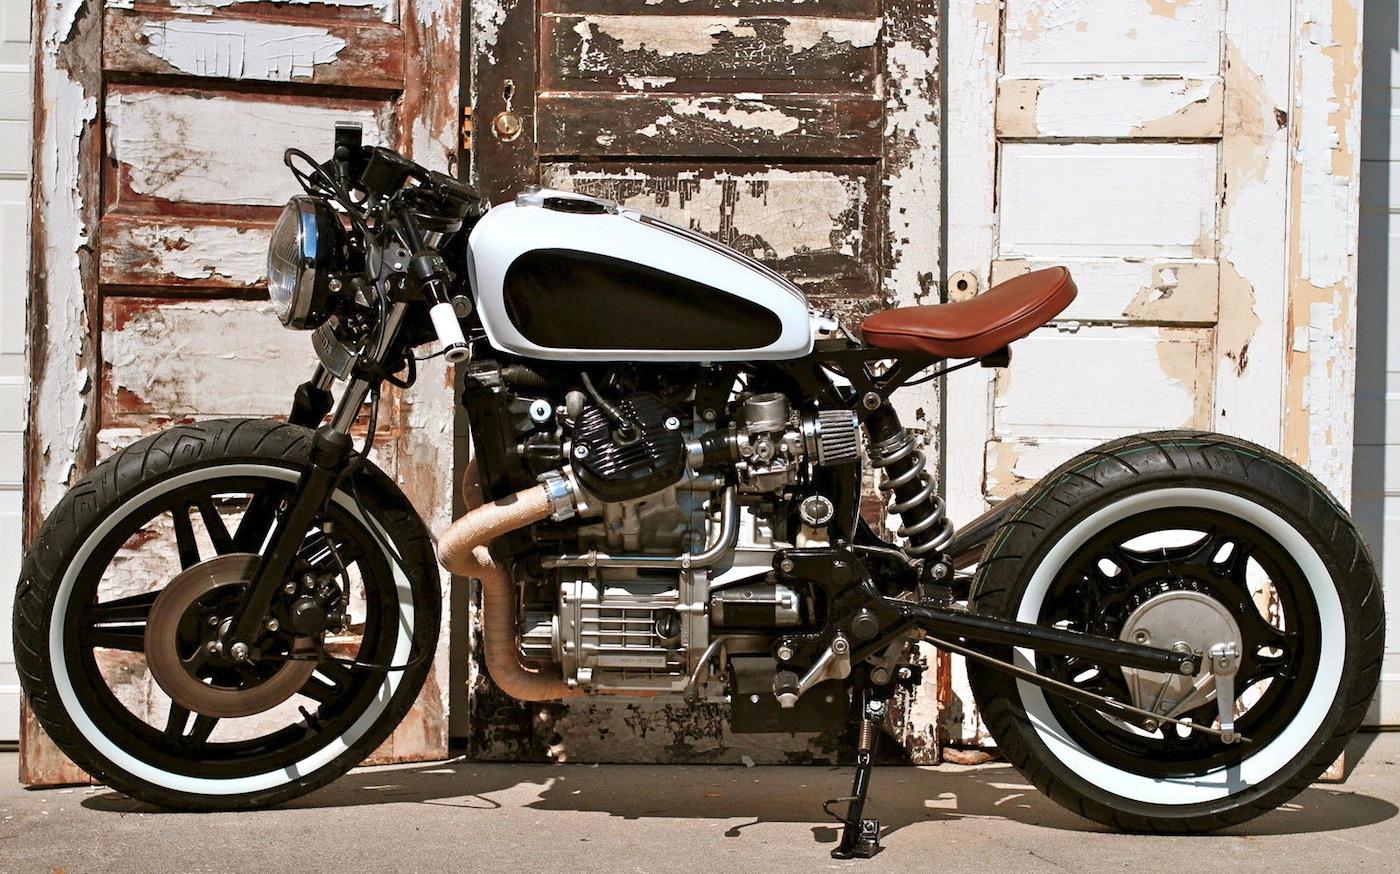 Cx500 By Magnum Opus Inazuma Caf 233 Racer